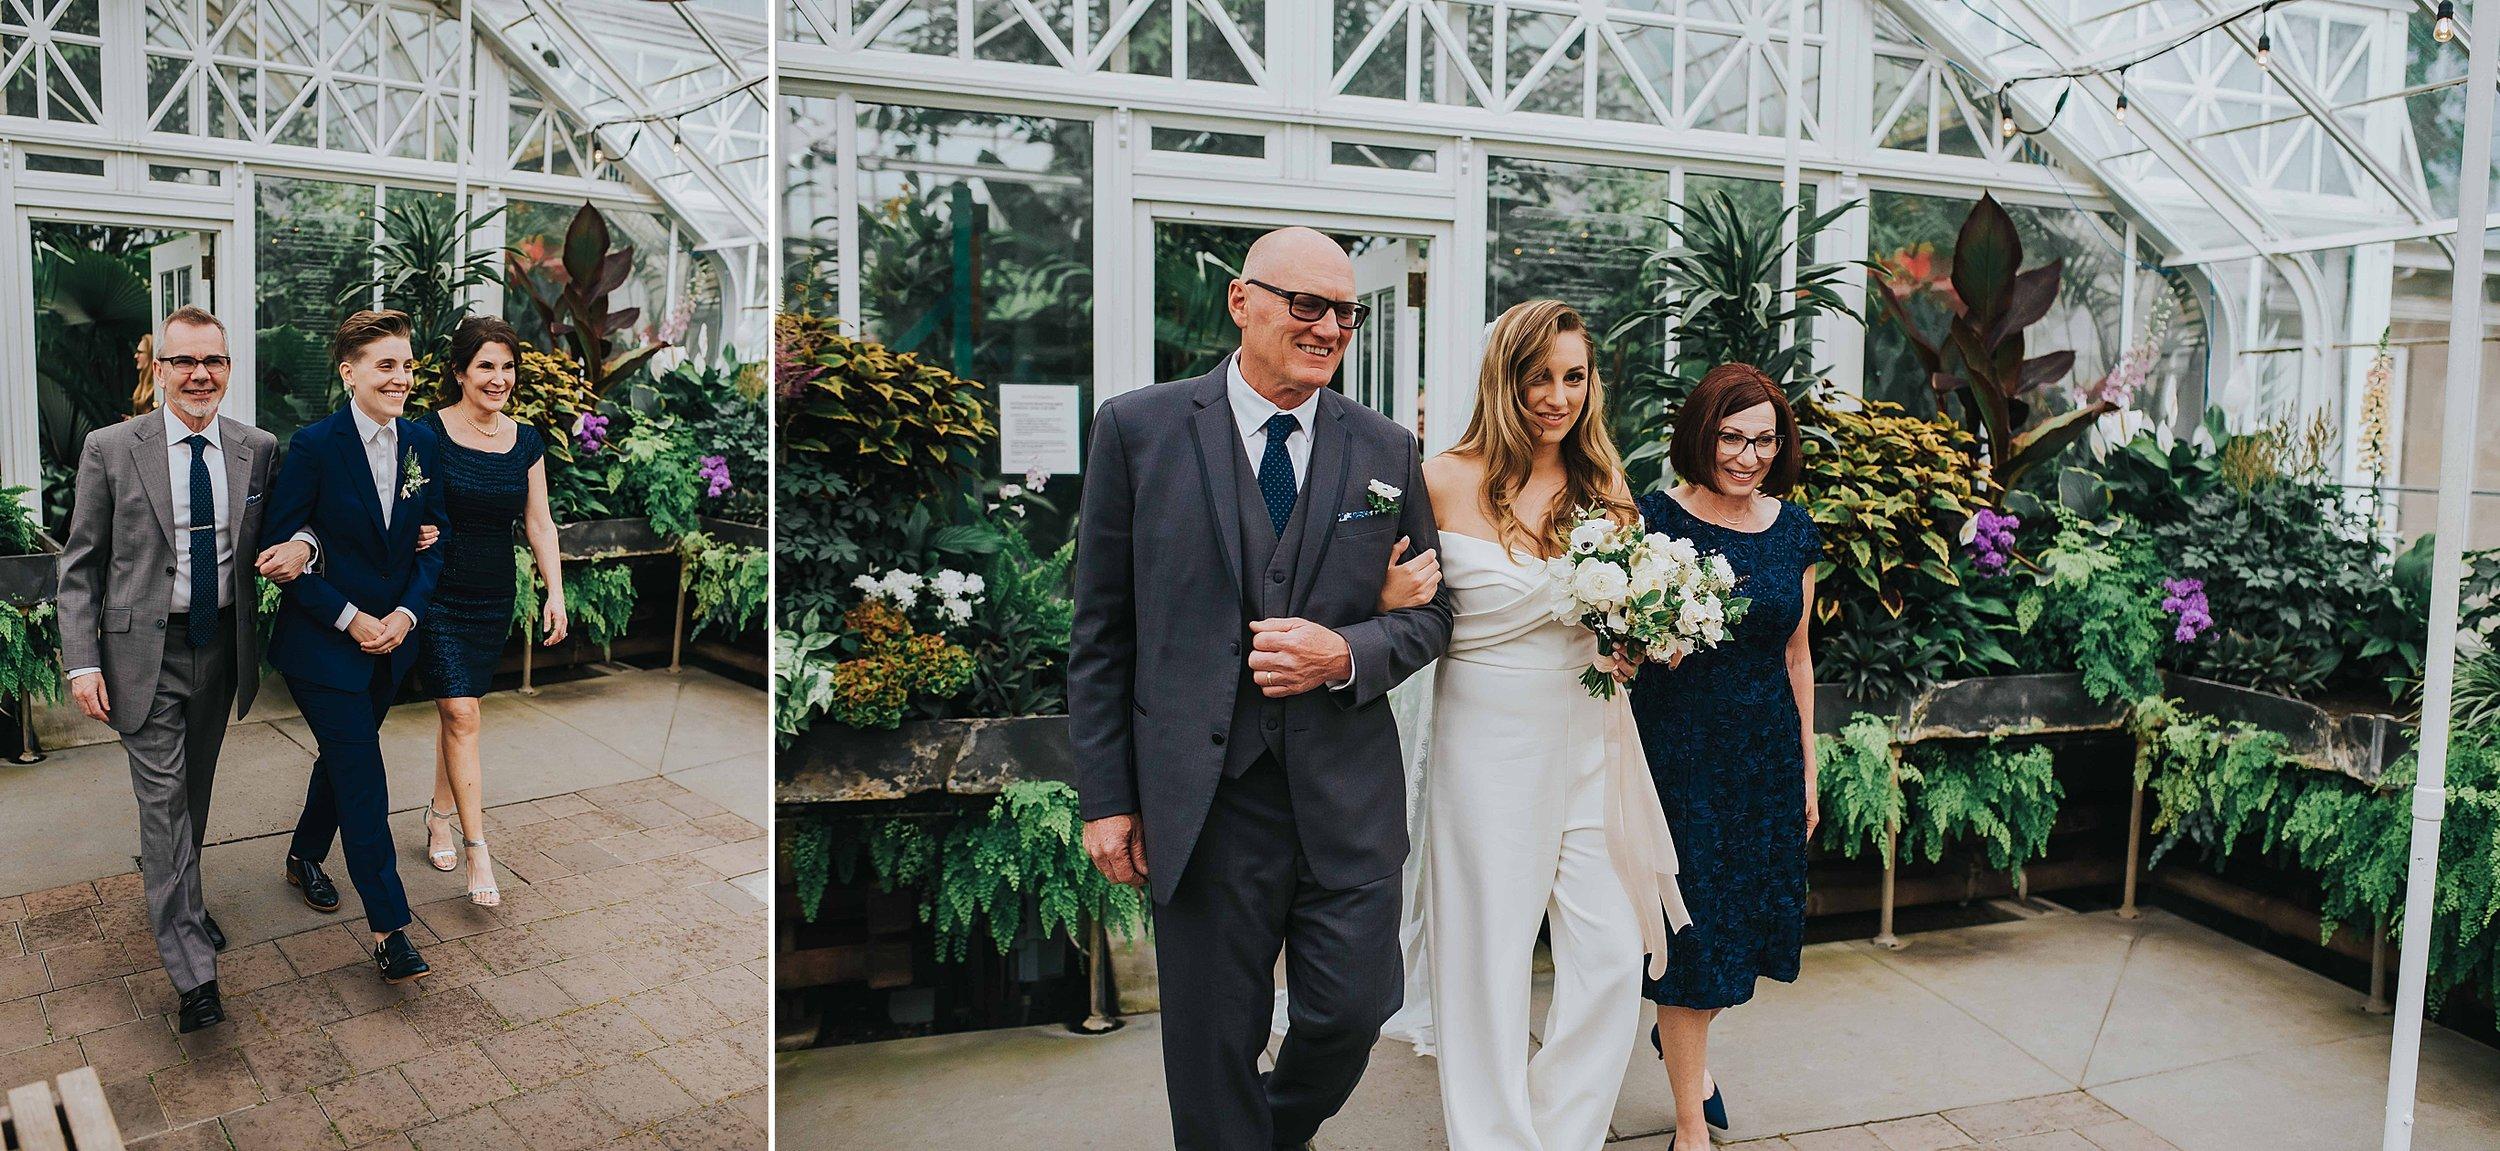 Seattle-Wedding-photographer-J HODGES PHOTOGRAPHY_0322.jpg